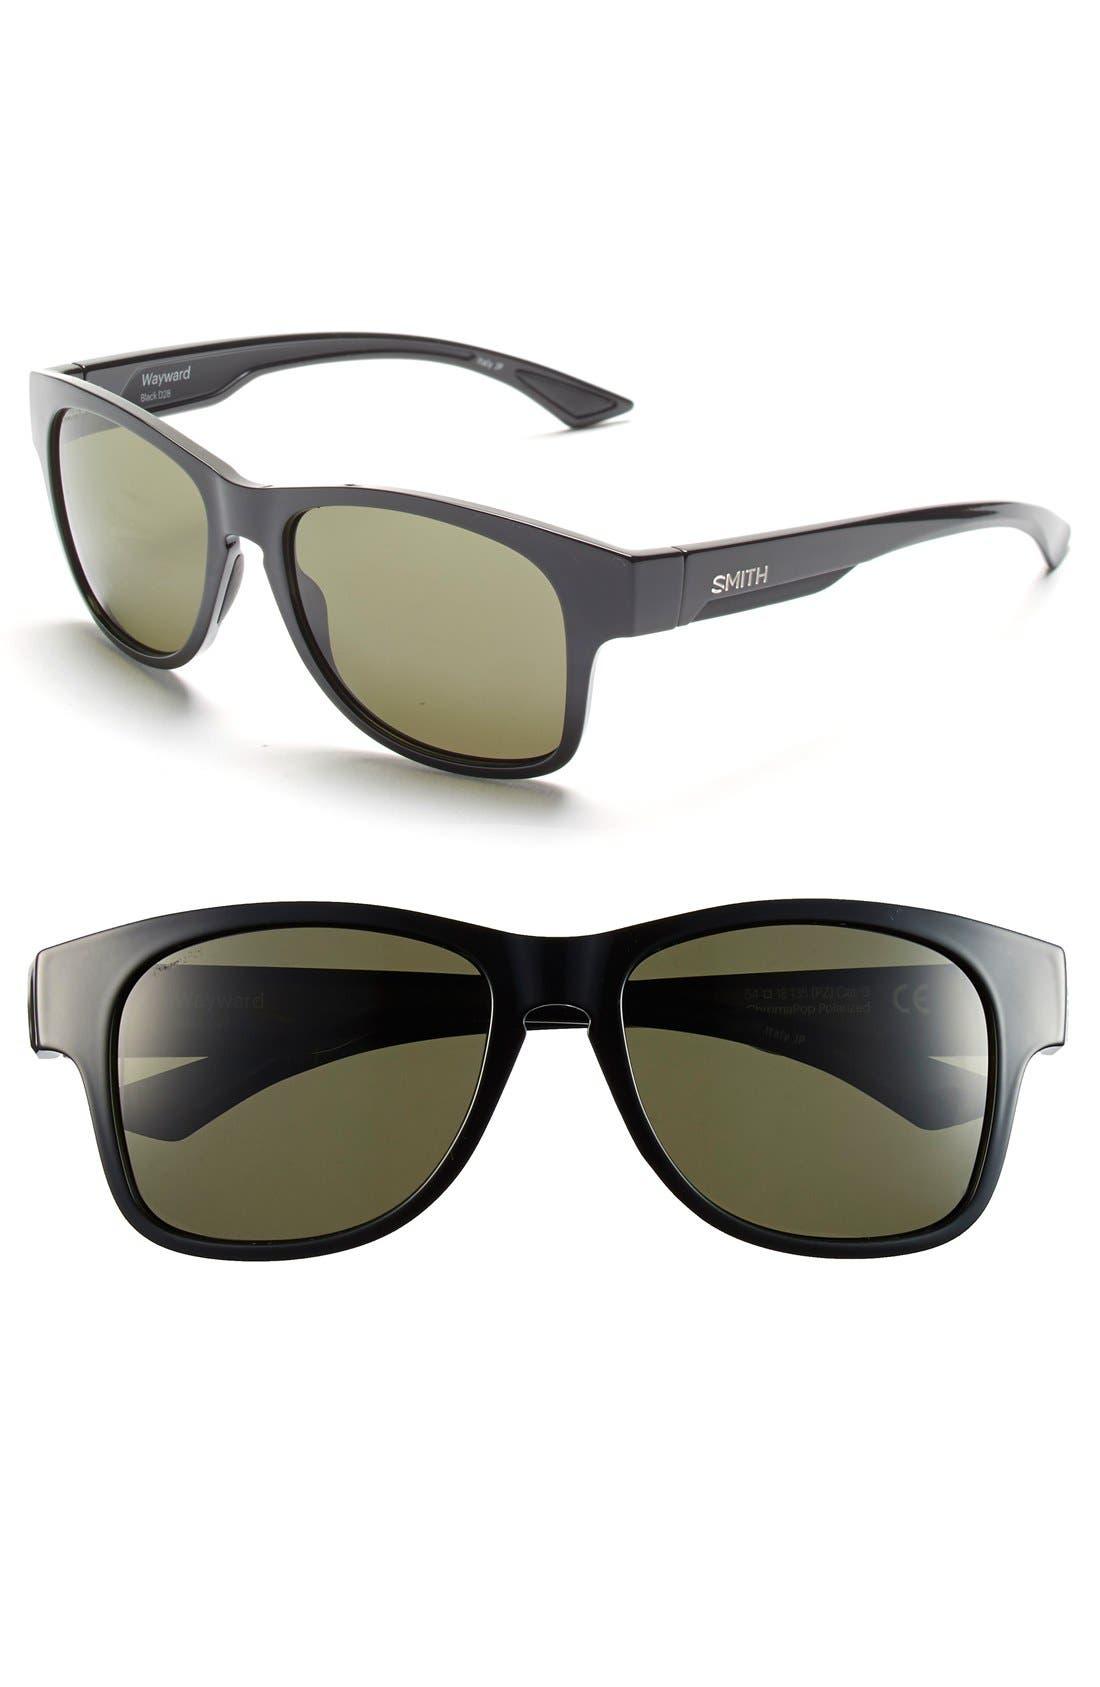 'Wayward' 54mm Polarized Sunglasses,                             Main thumbnail 1, color,                             Black/ Polar Gray Green